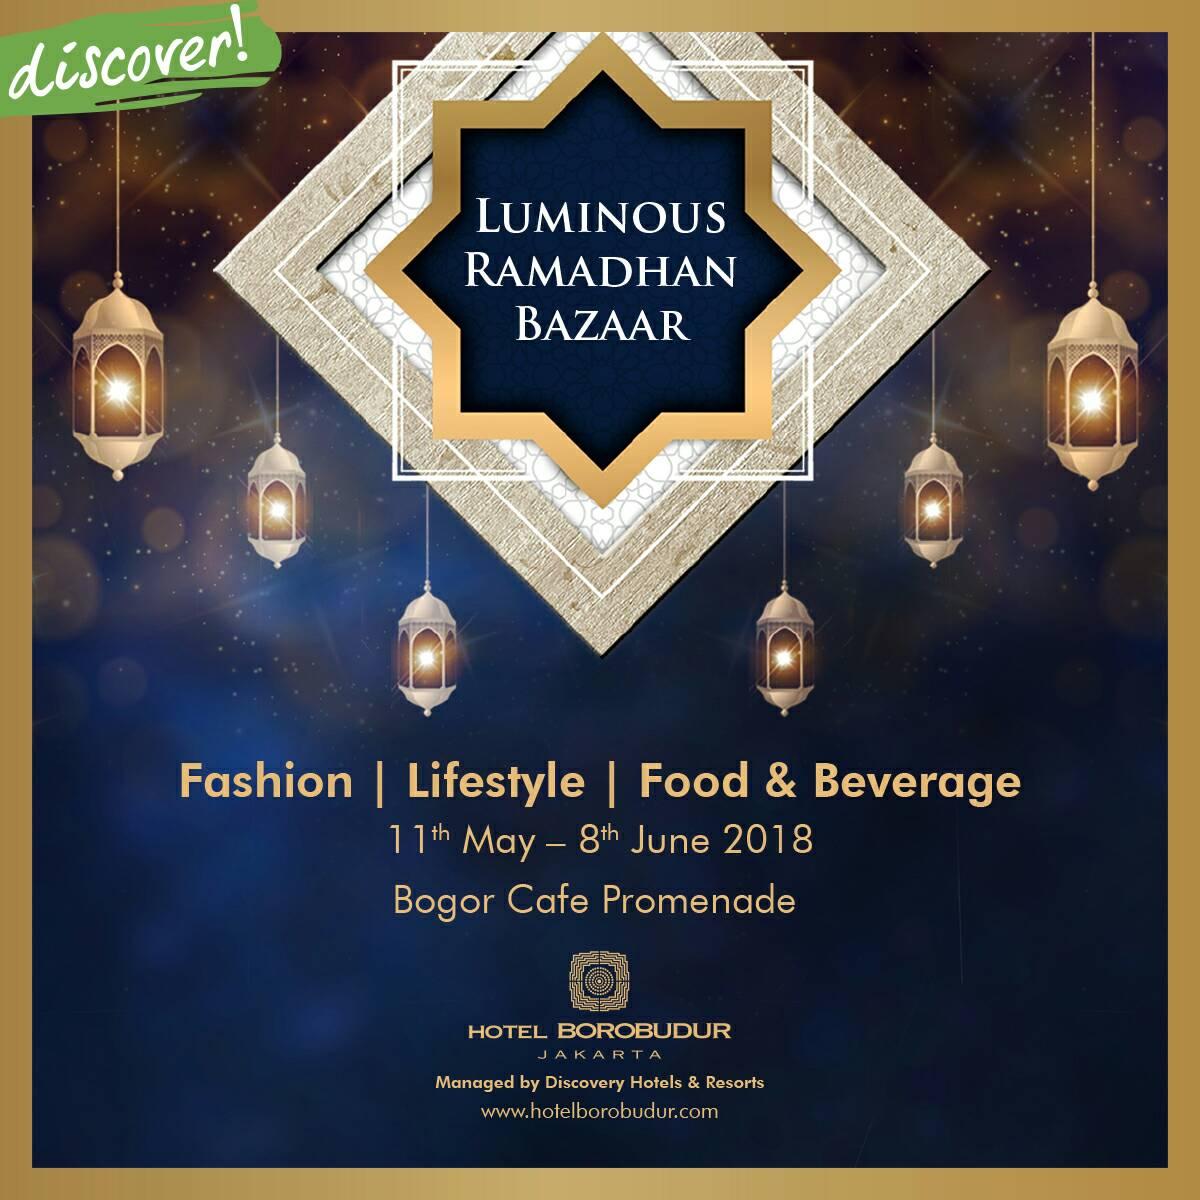 Hotel Borobudur Jakarta V Twitter Ramadhan Is Near Let S